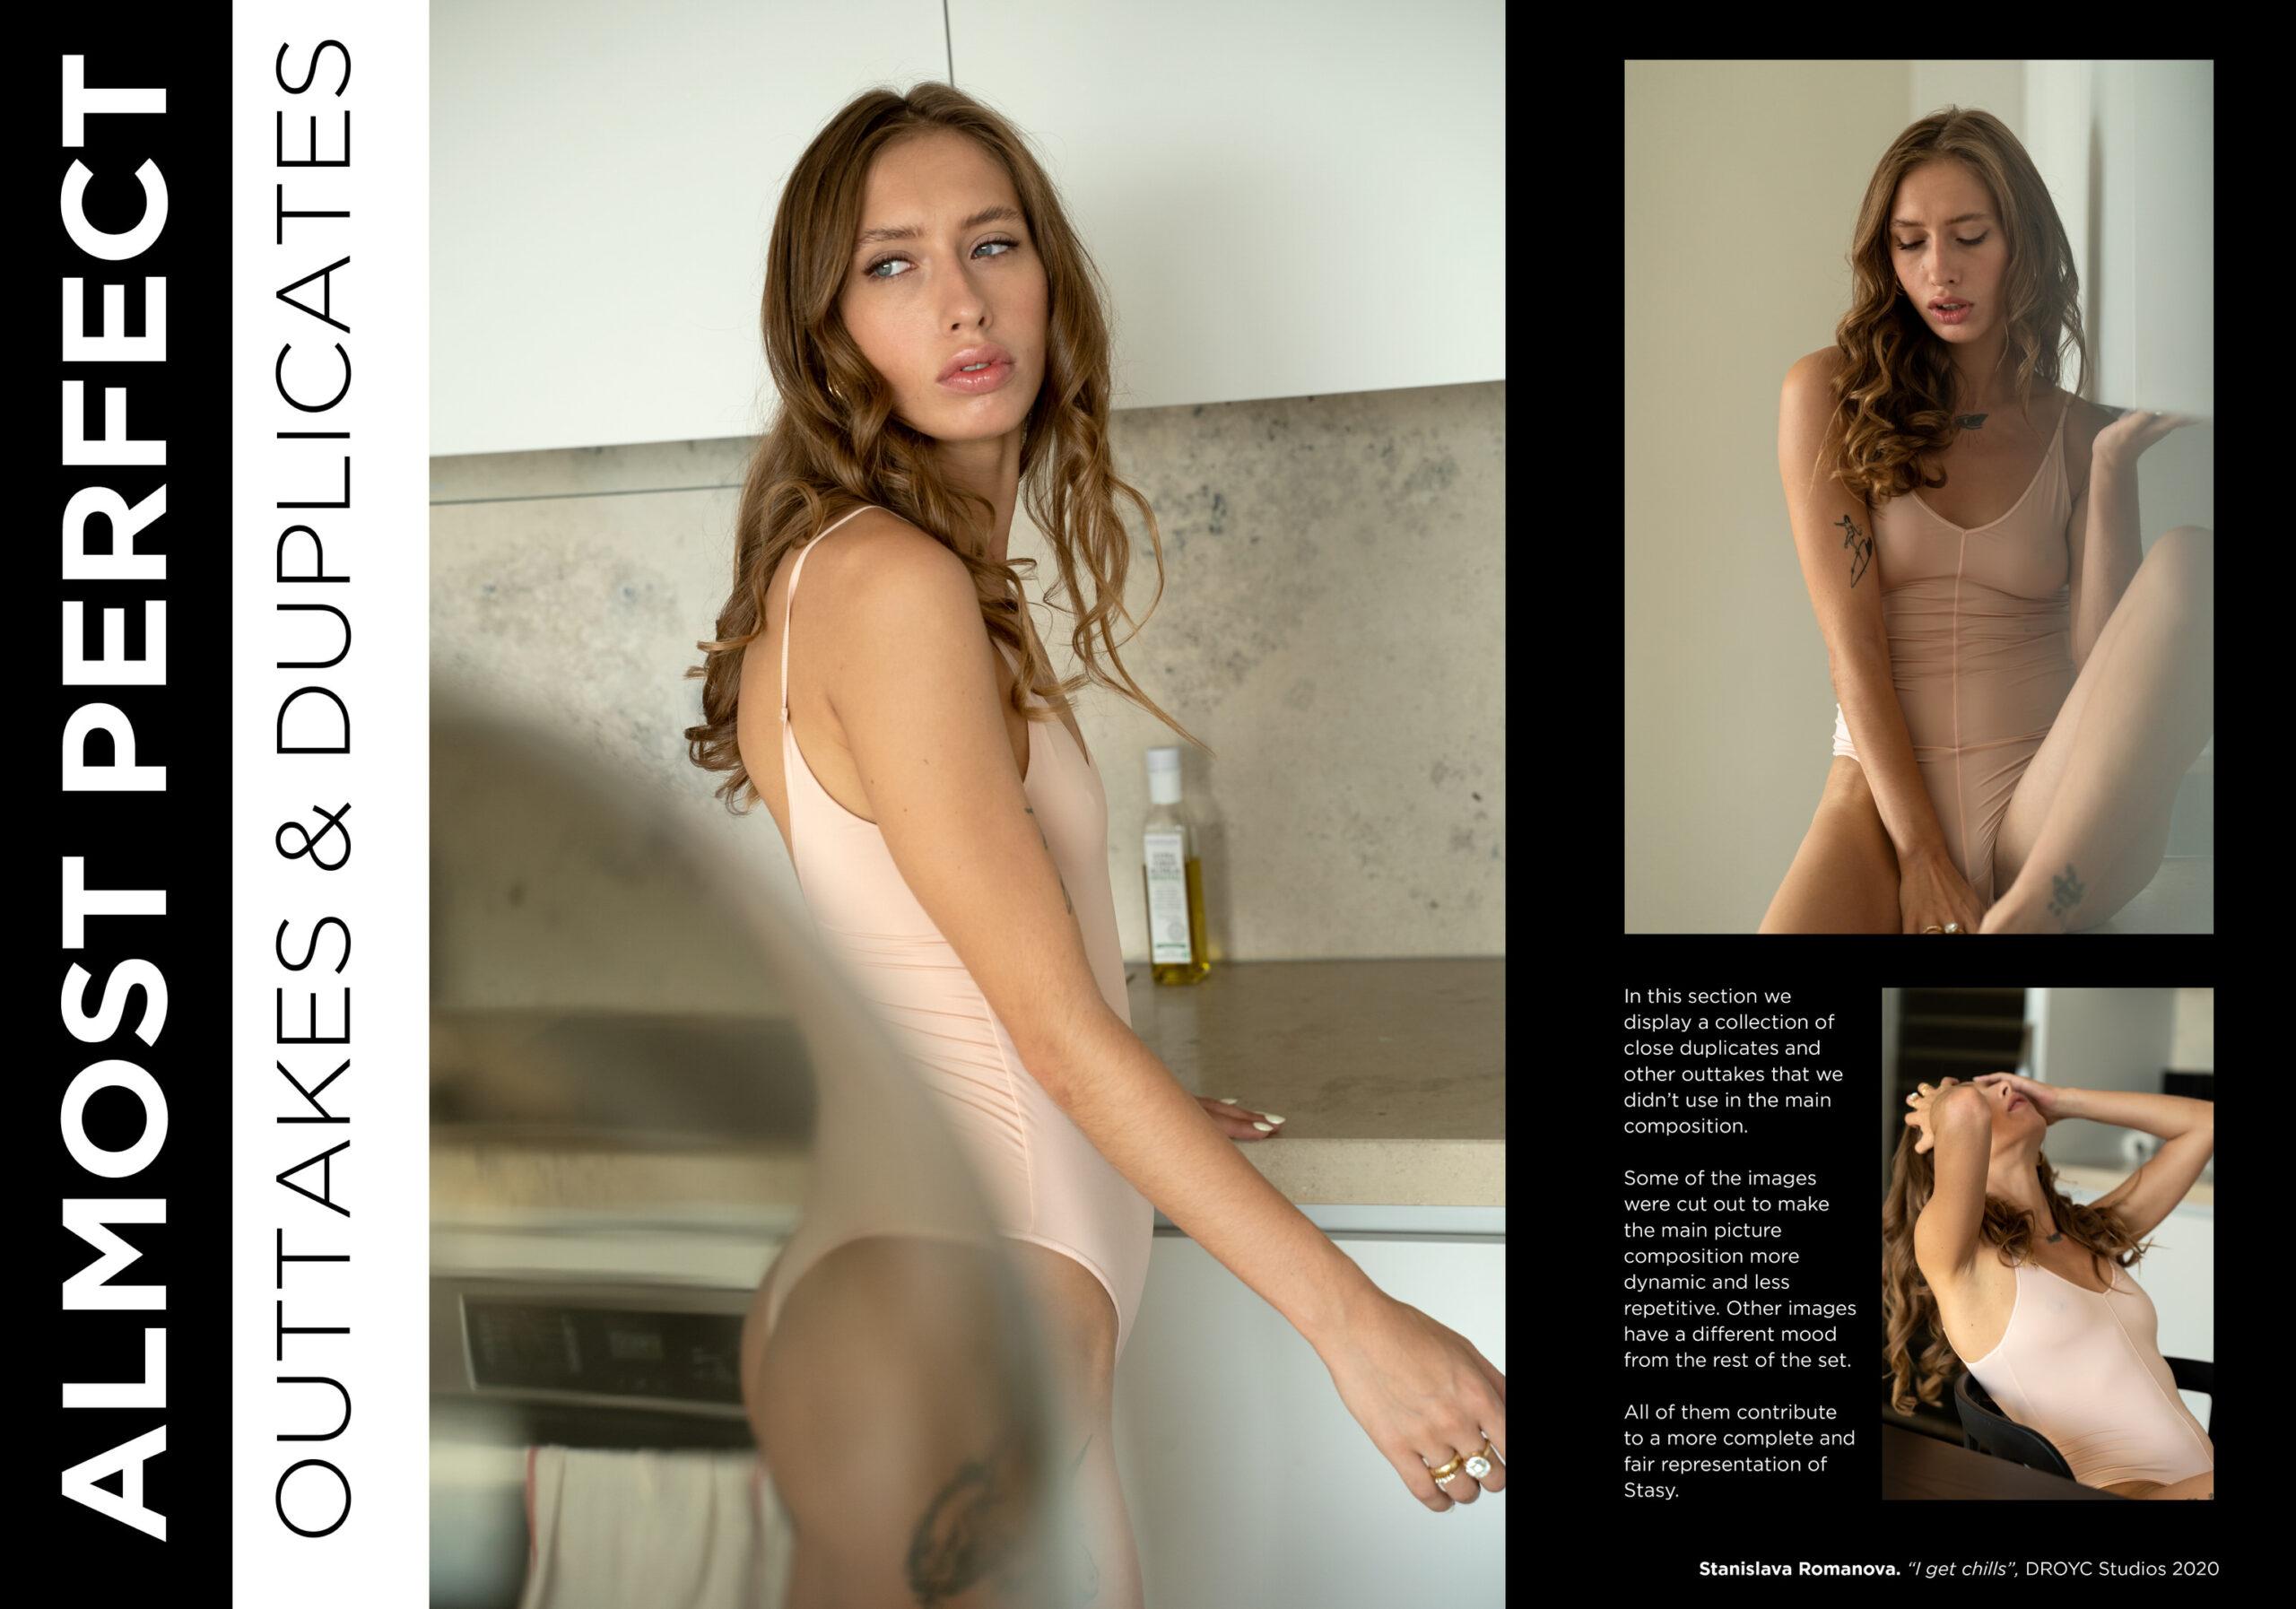 StanislavaRomanova-DROYC-I_get_chills-33d